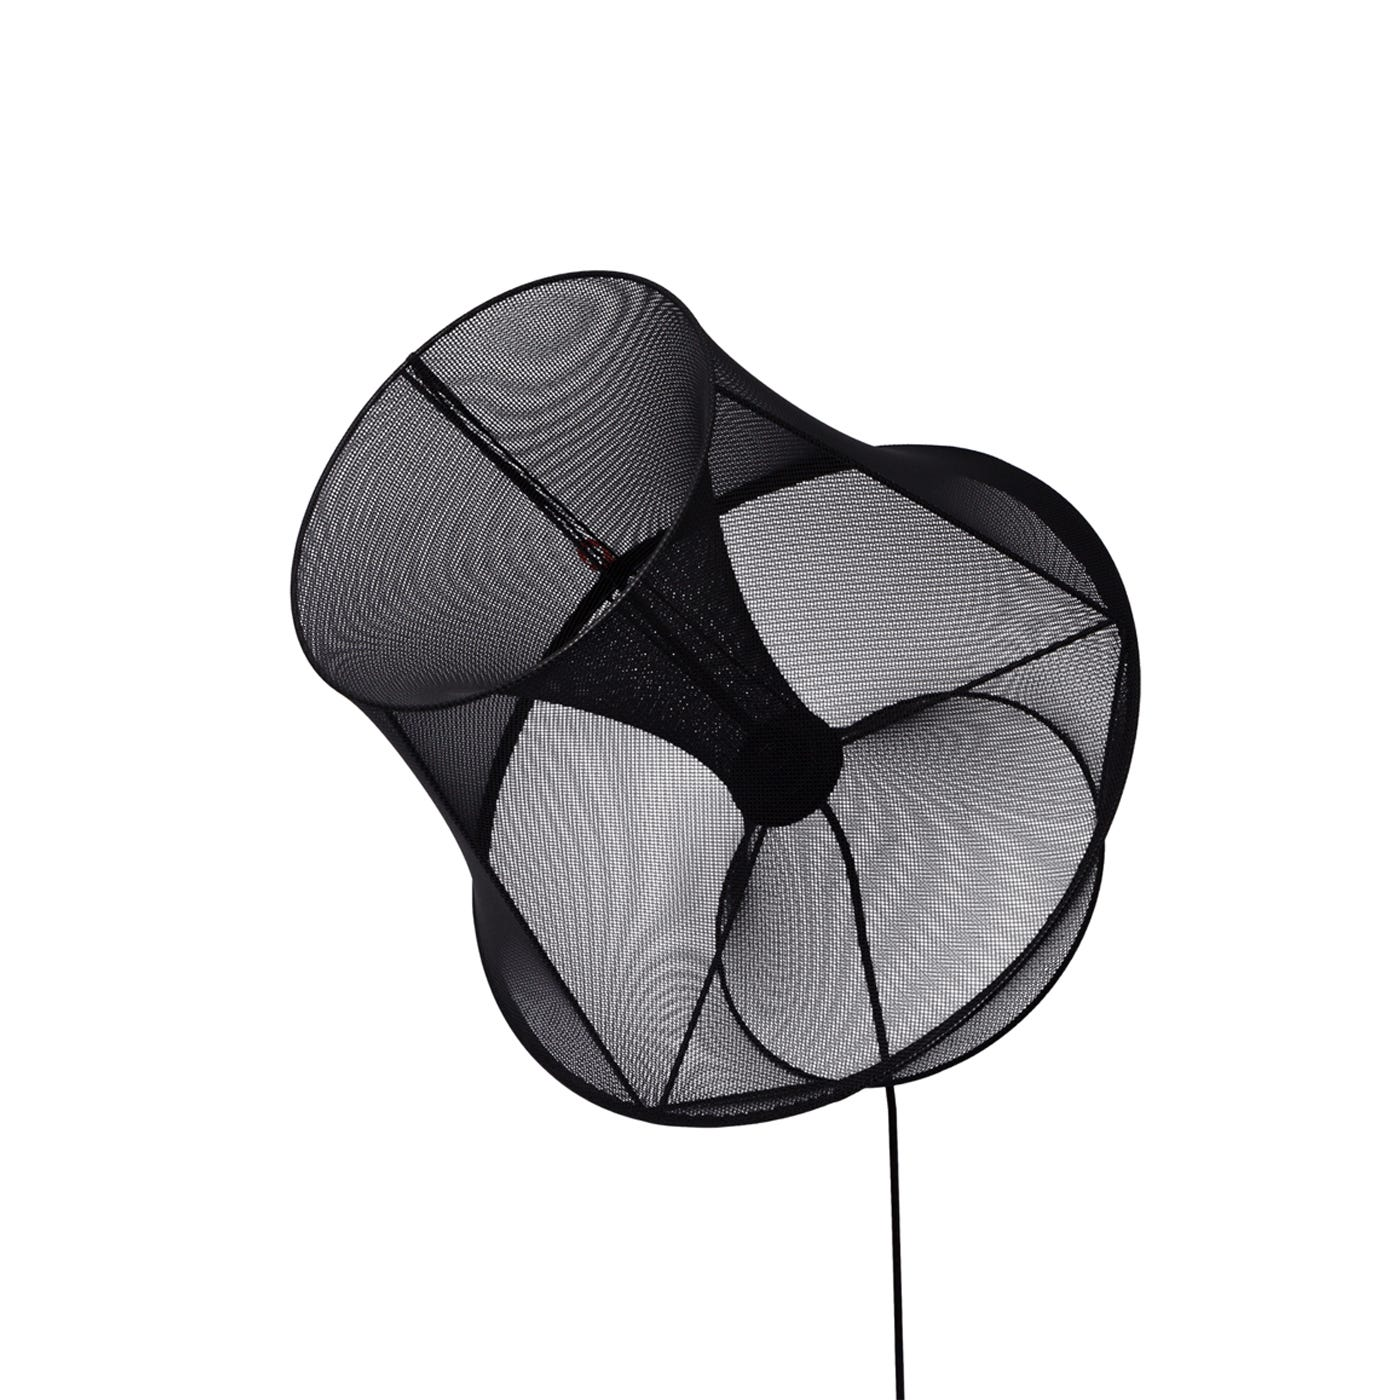 Moire Multi Purpose Lamp Black